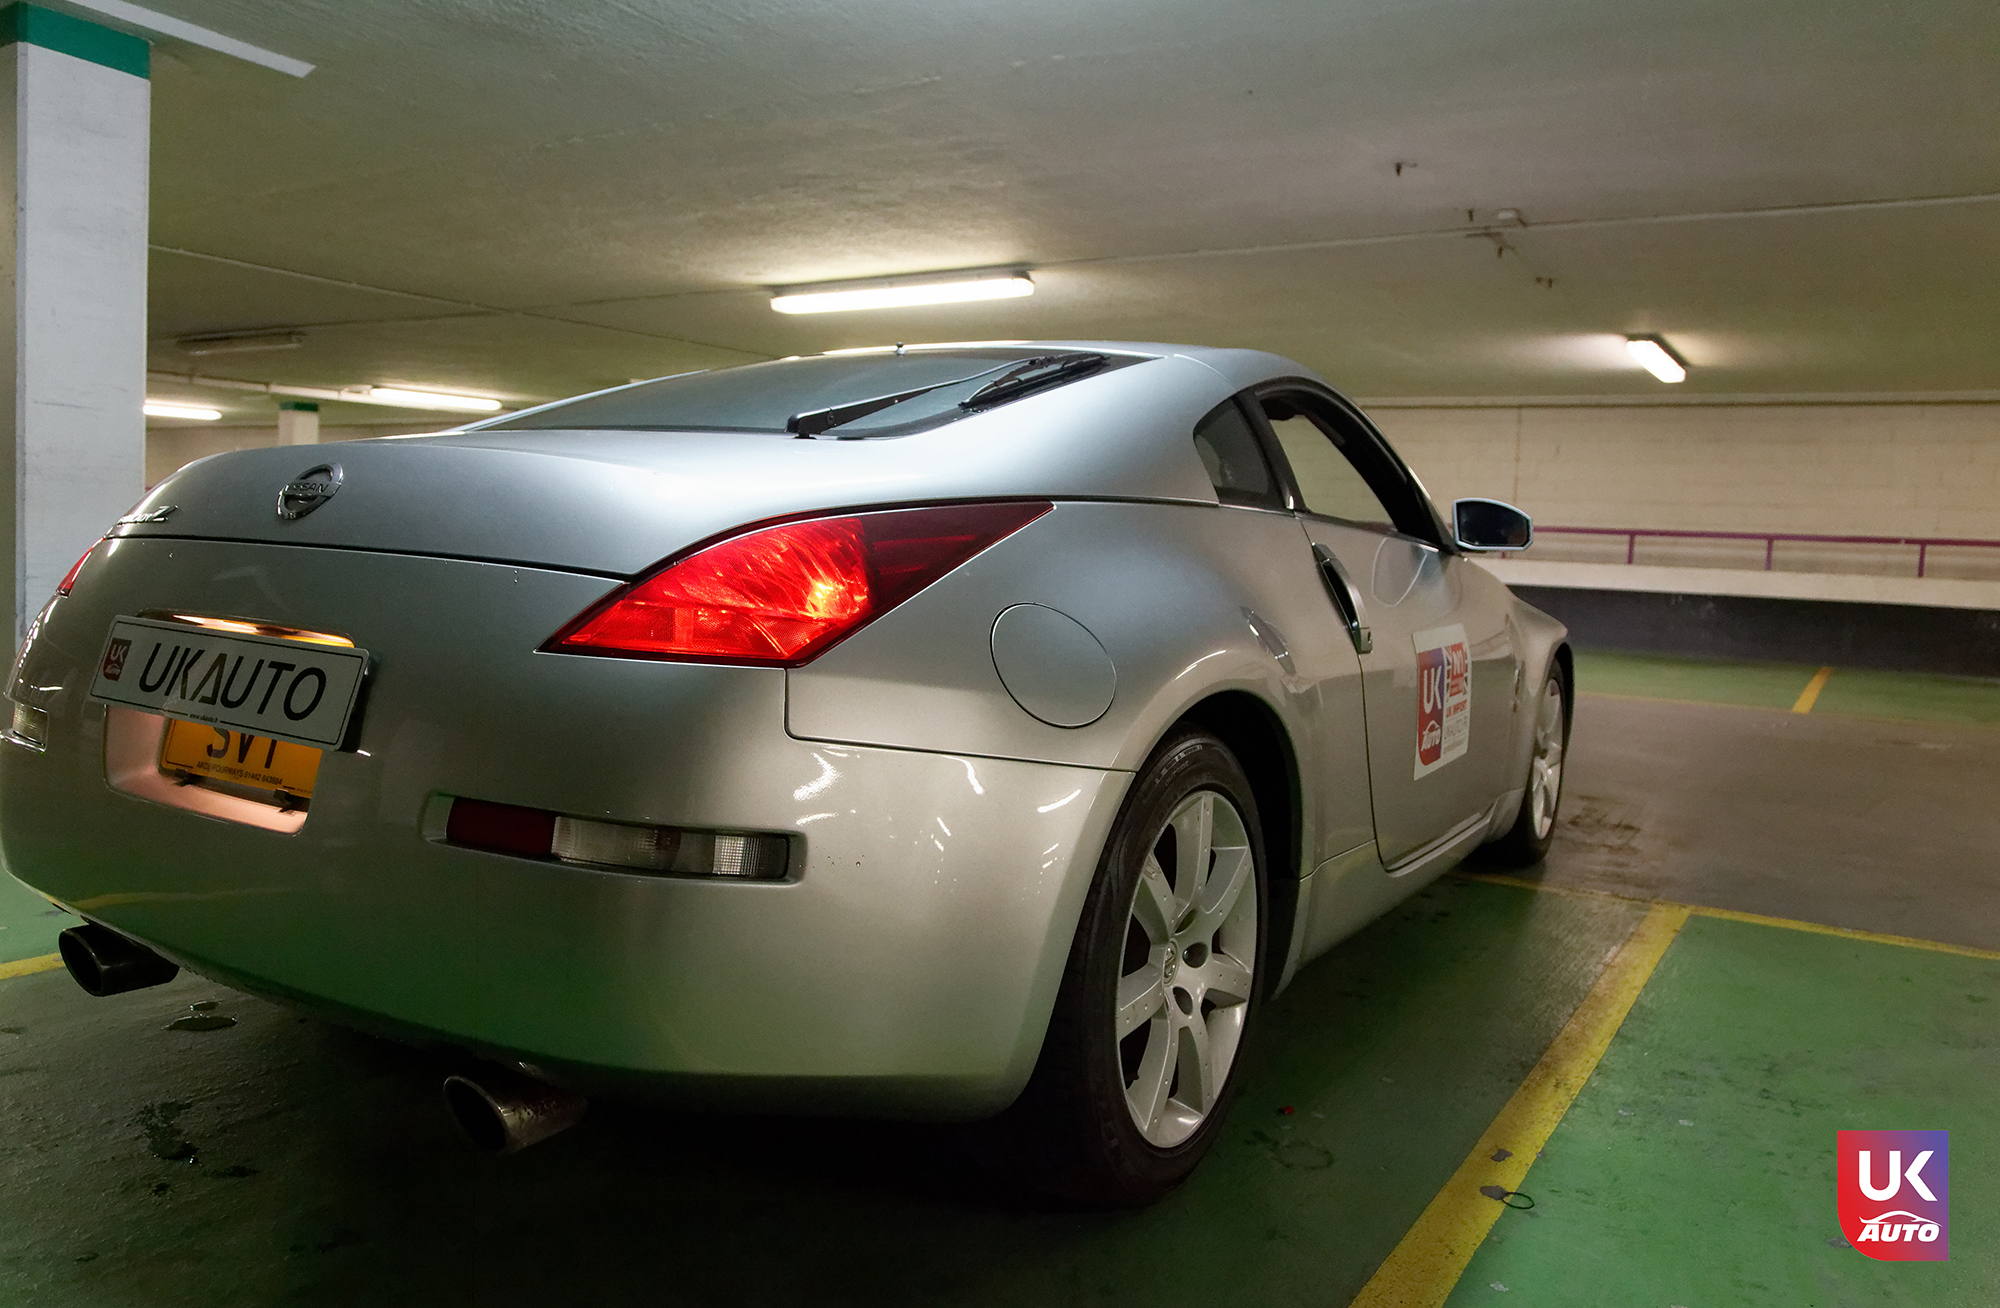 Ukauto import nissan 350z jdm import fairlady v6 import uk ukauto rhd nissan import uk8 - Import Nissan 350Z JDM IMPORT 3.5 V6 TIPTRONIC IMPORT AUTO par UKAUTO